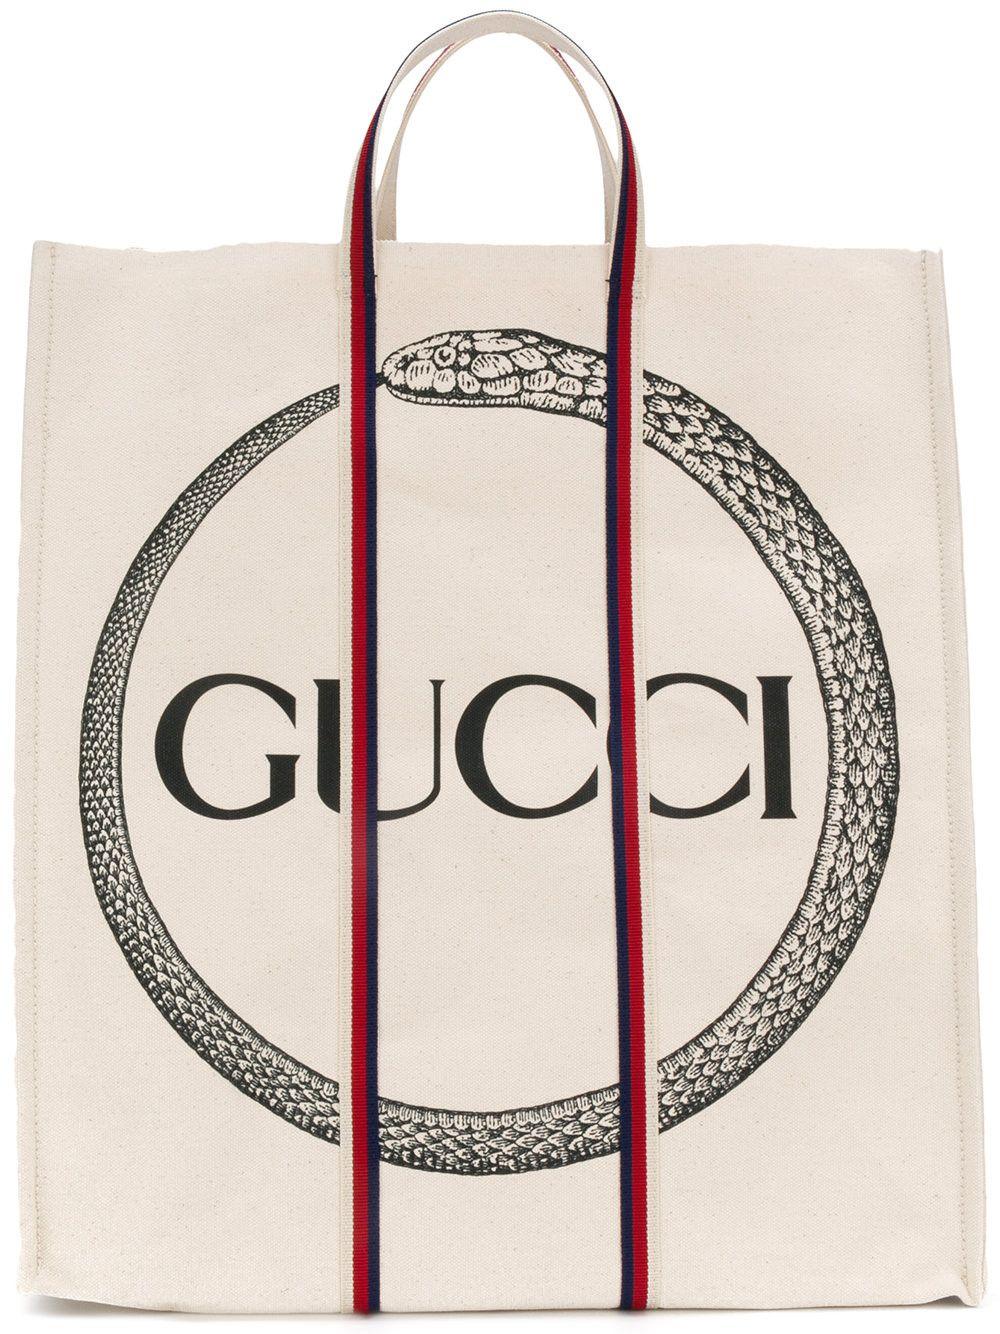 99cdb8752ee4 Gucci ouroboros print tote   Ink   Gucci tote bag, Cotton tote bags ...